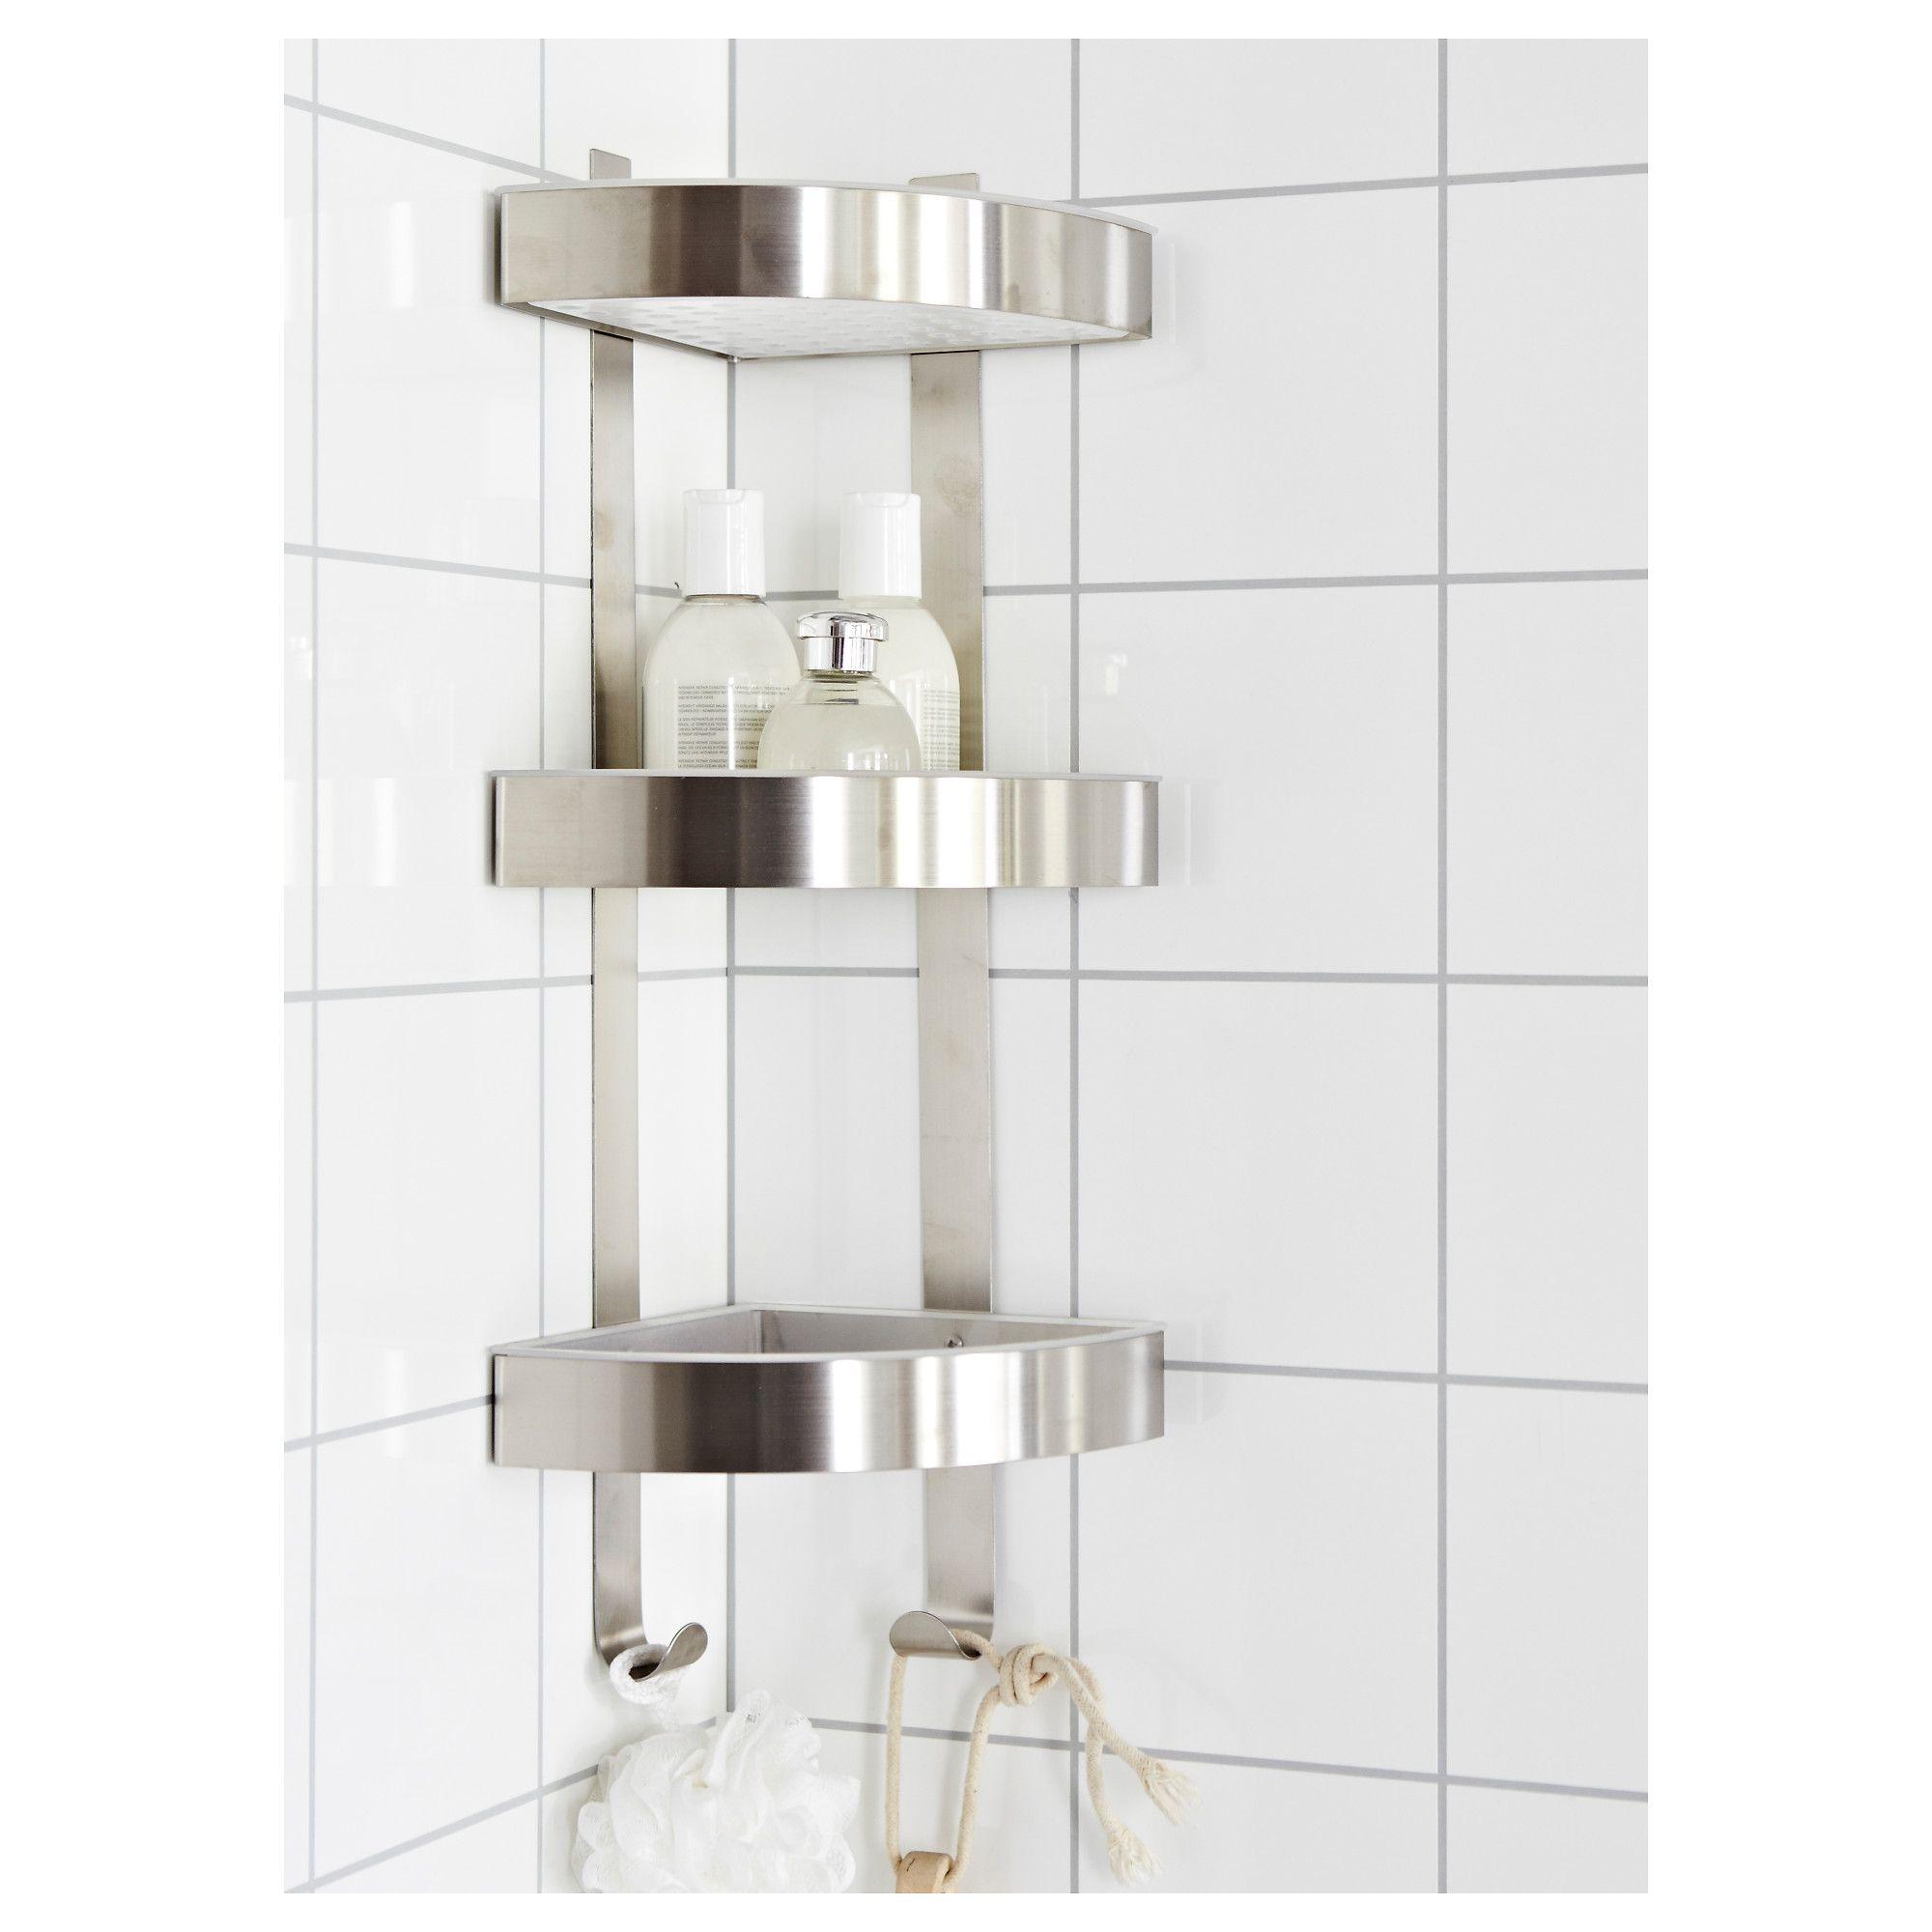 Shop For Furniture Lighting Home Accessories More Corner Wall Shelf Unit Kitchen Corner Units Wall Shelf Unit